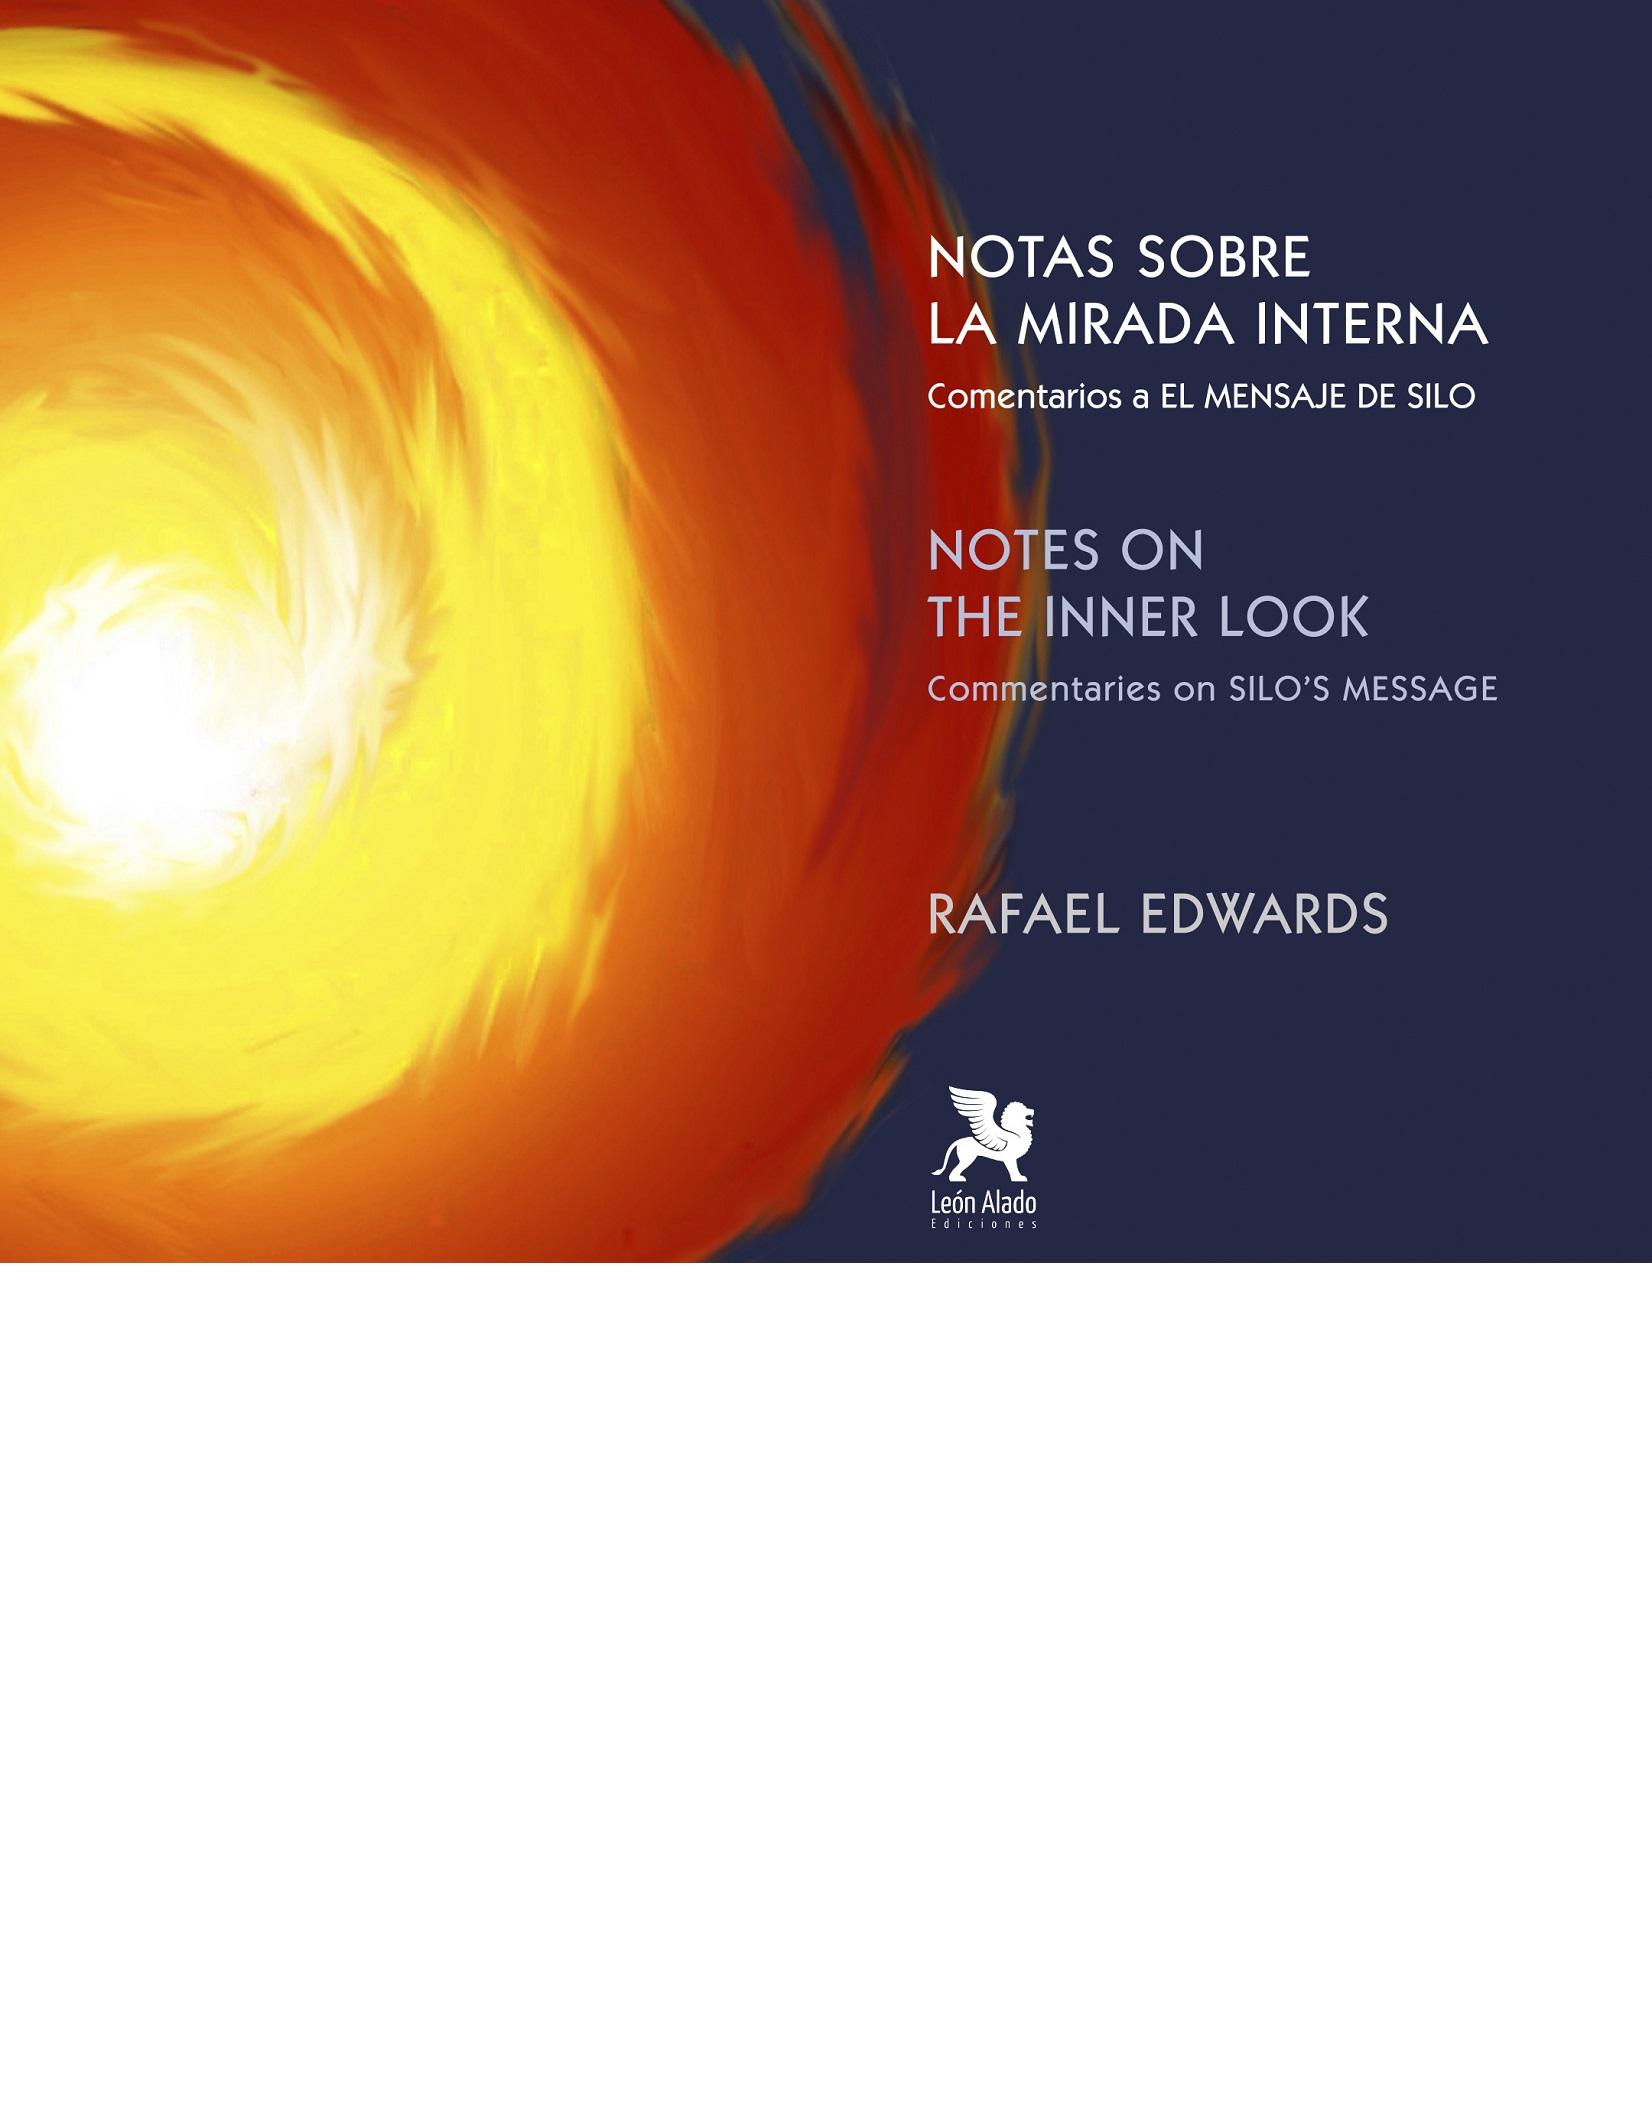 Notas sobre la Mirada Interna / Notes on the Inner Look